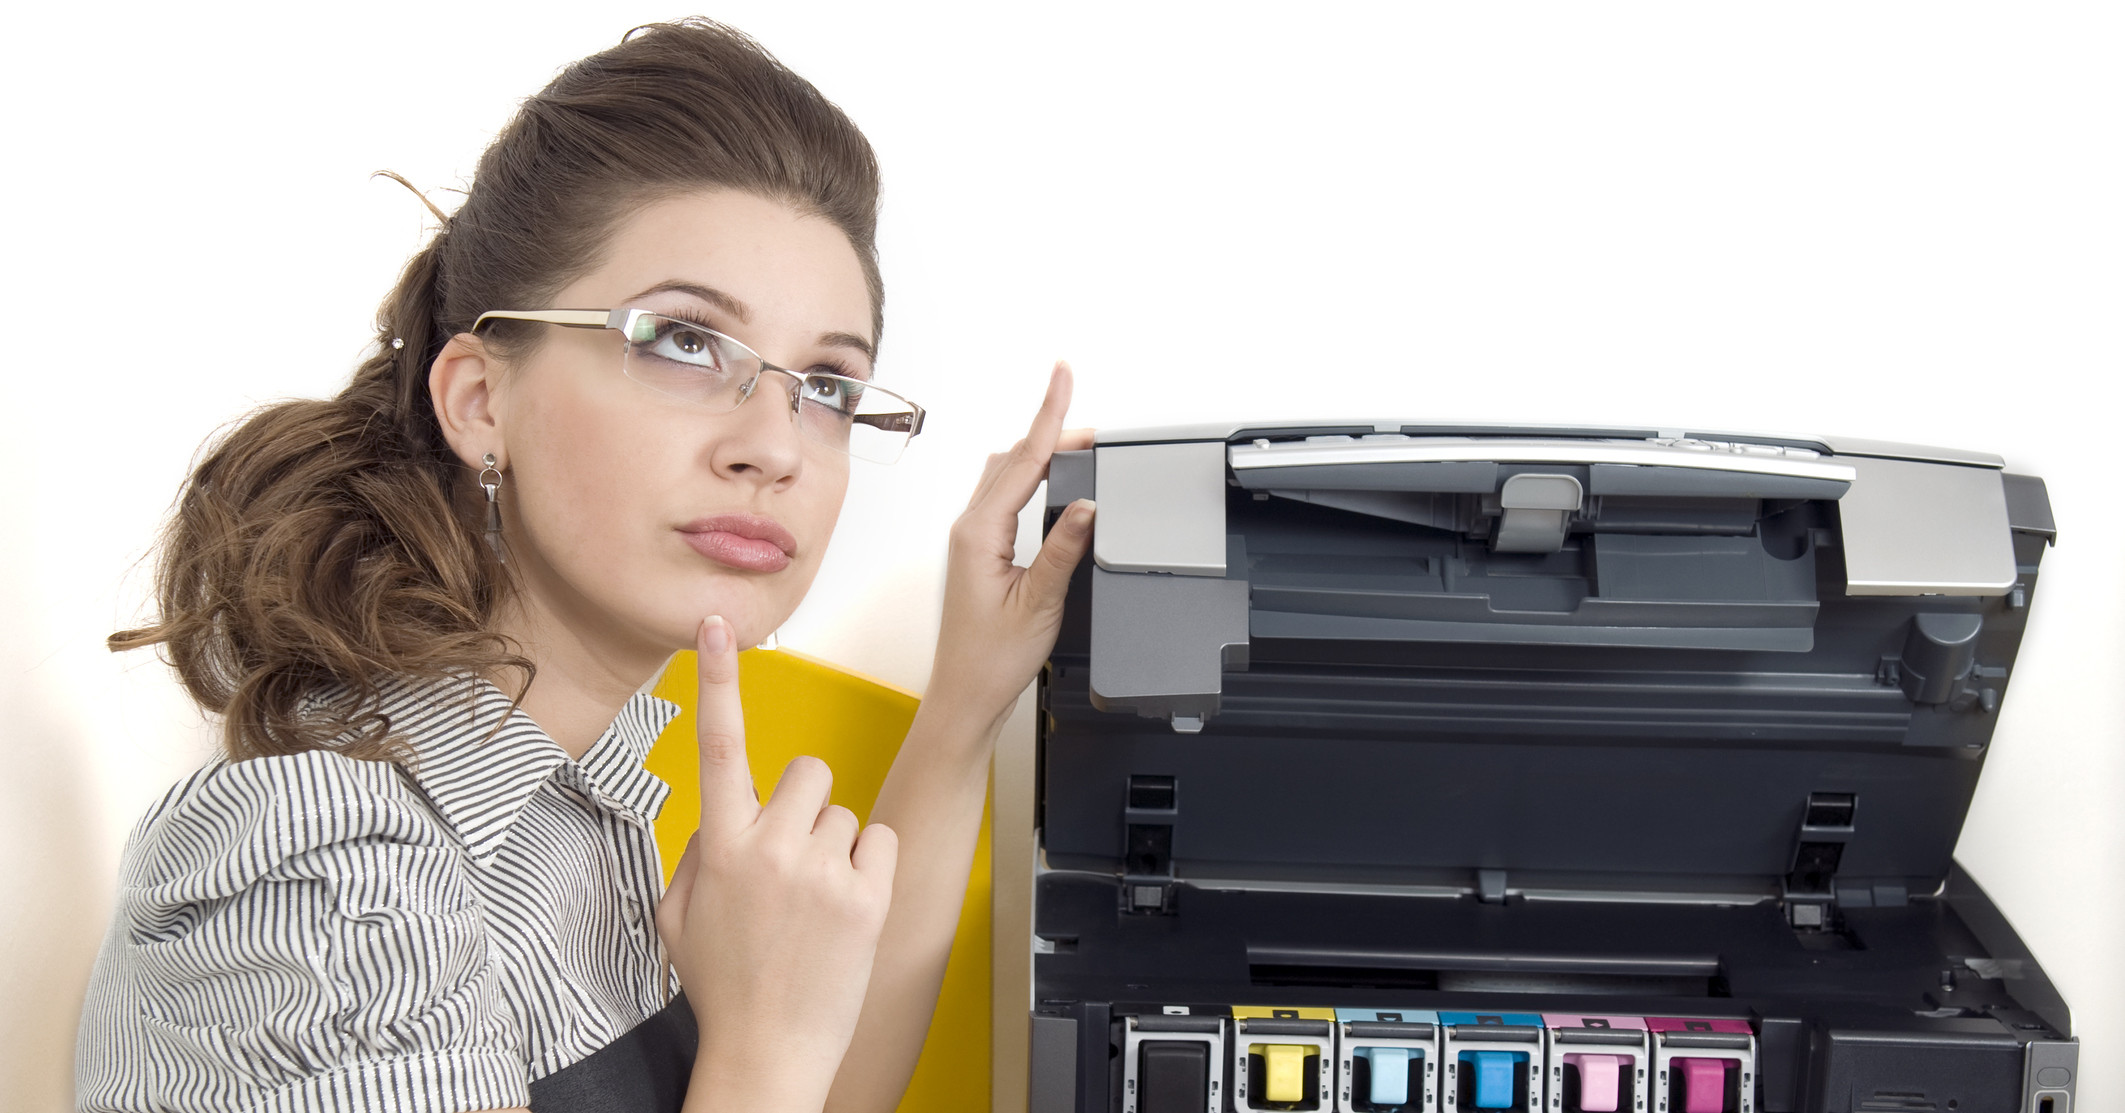 Почистить принтер домашних условиях